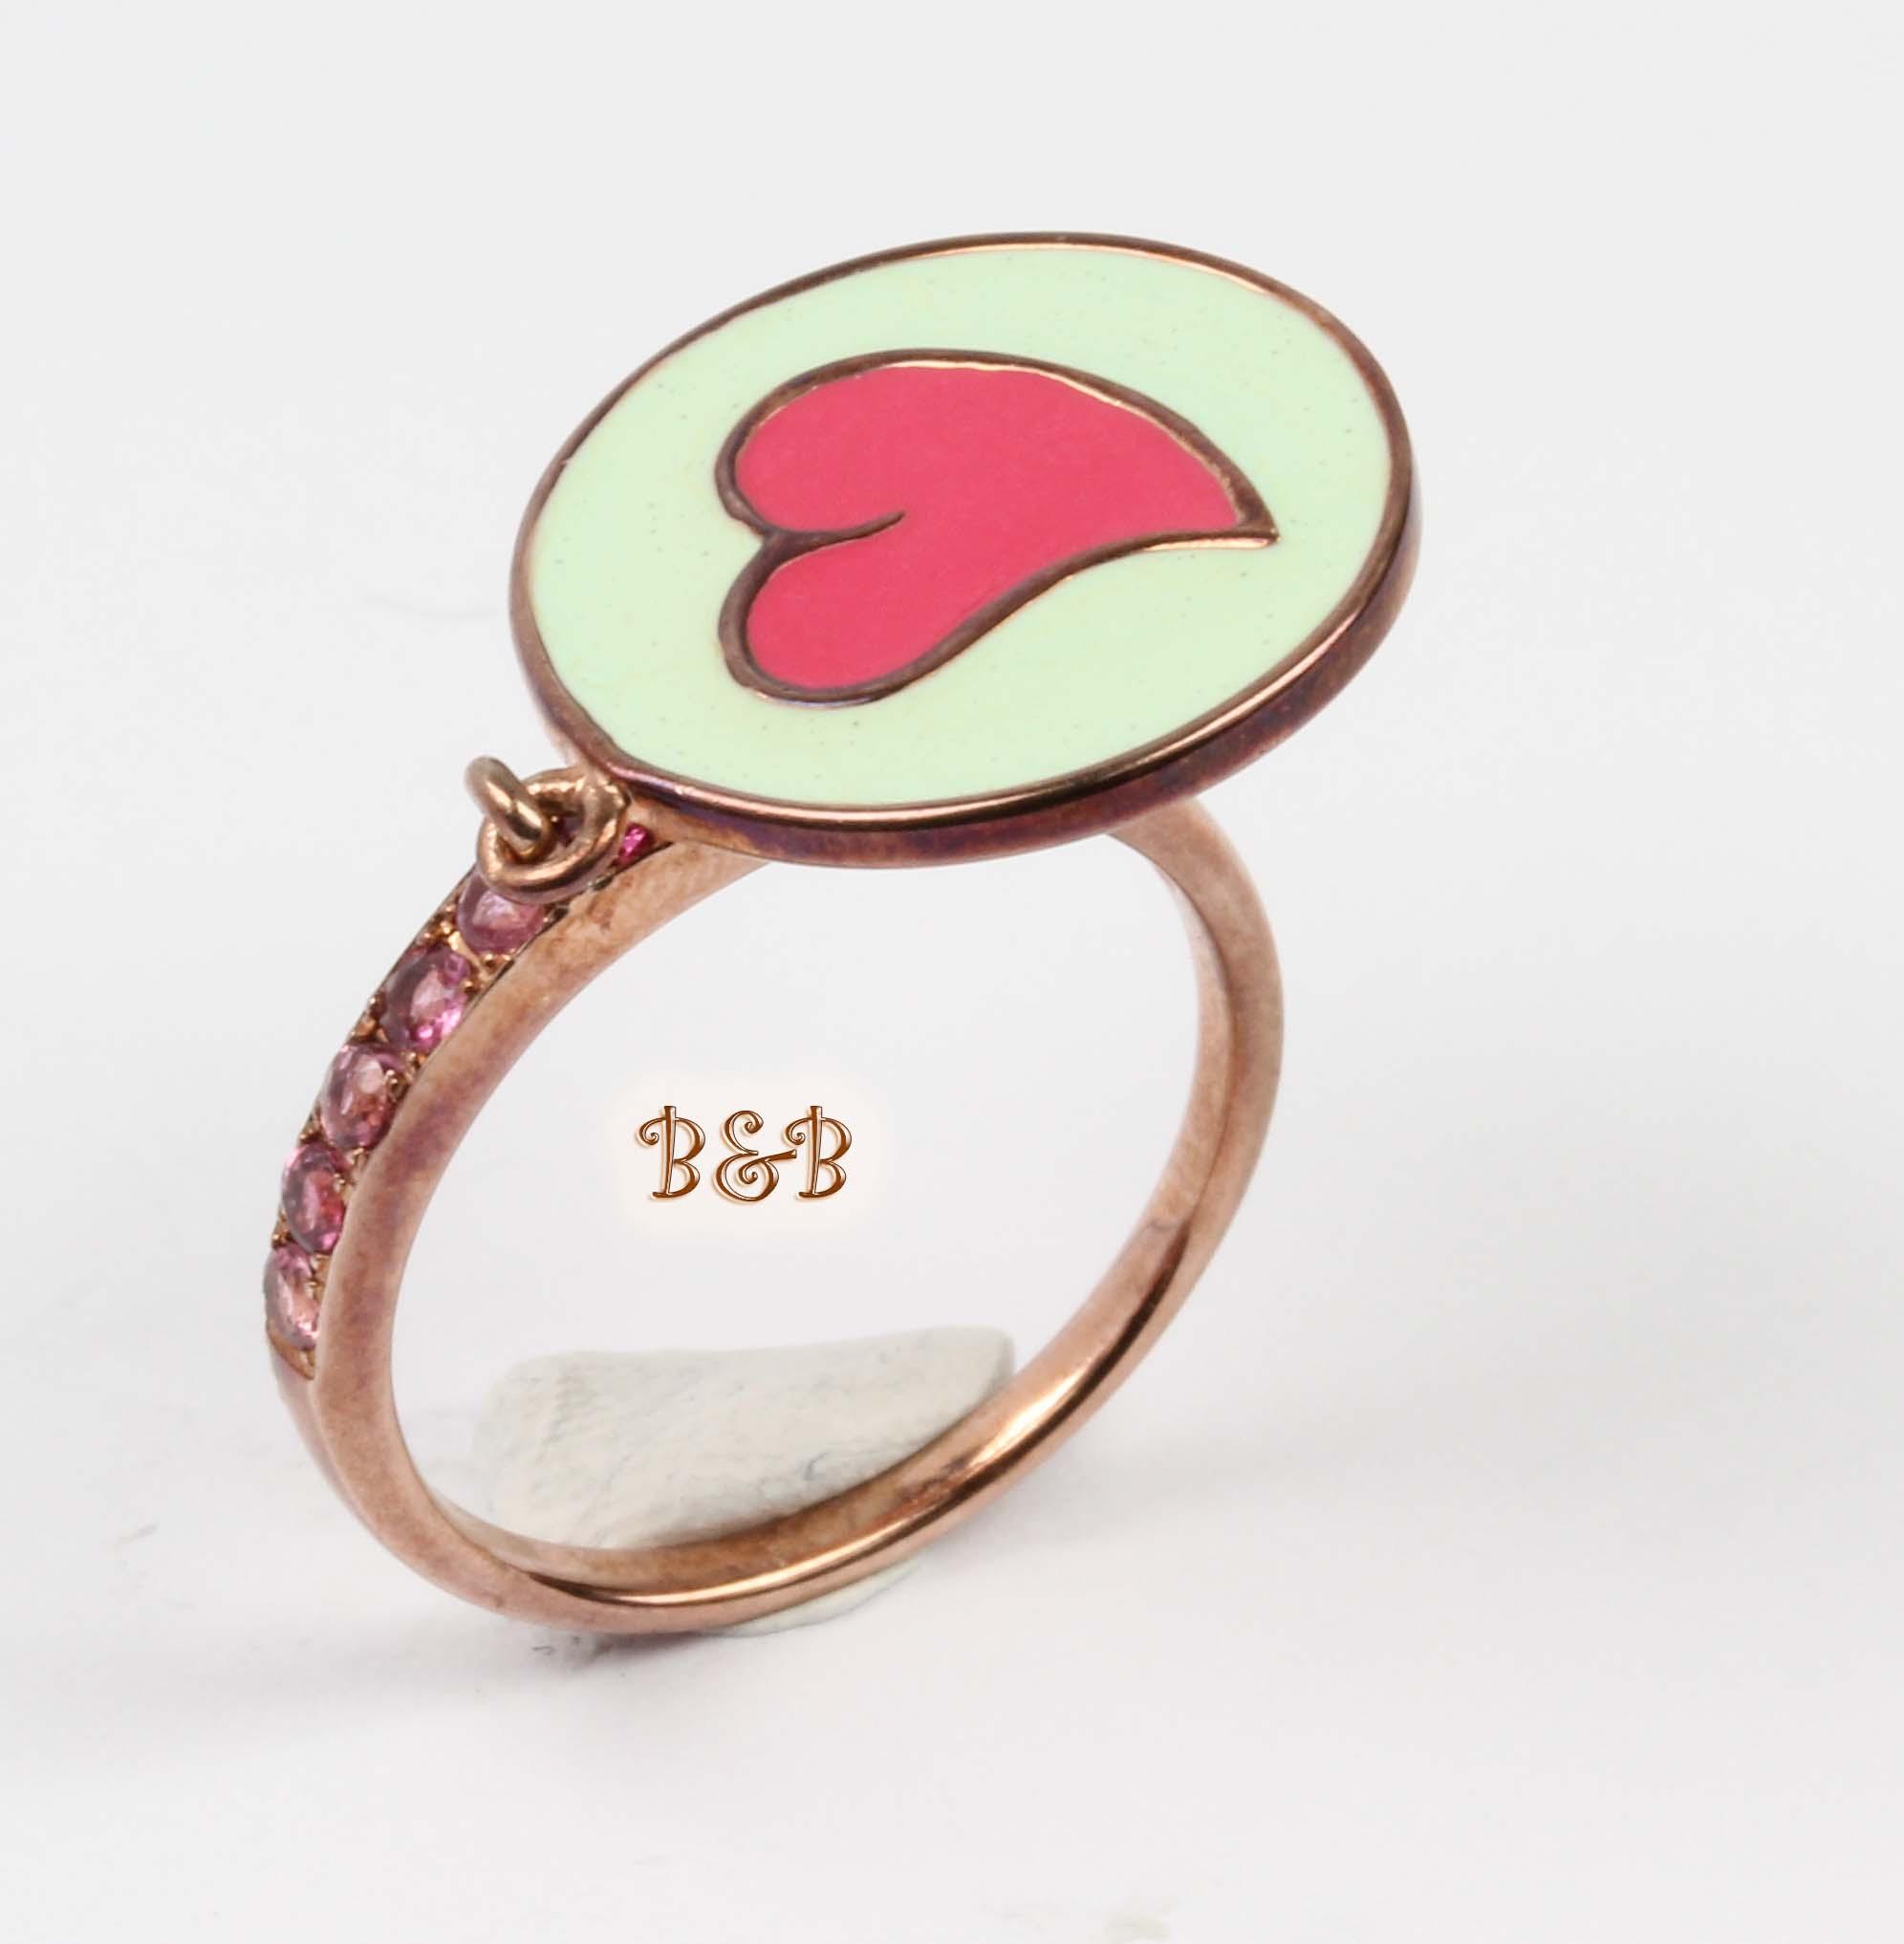 Silver ring_B&B_1722